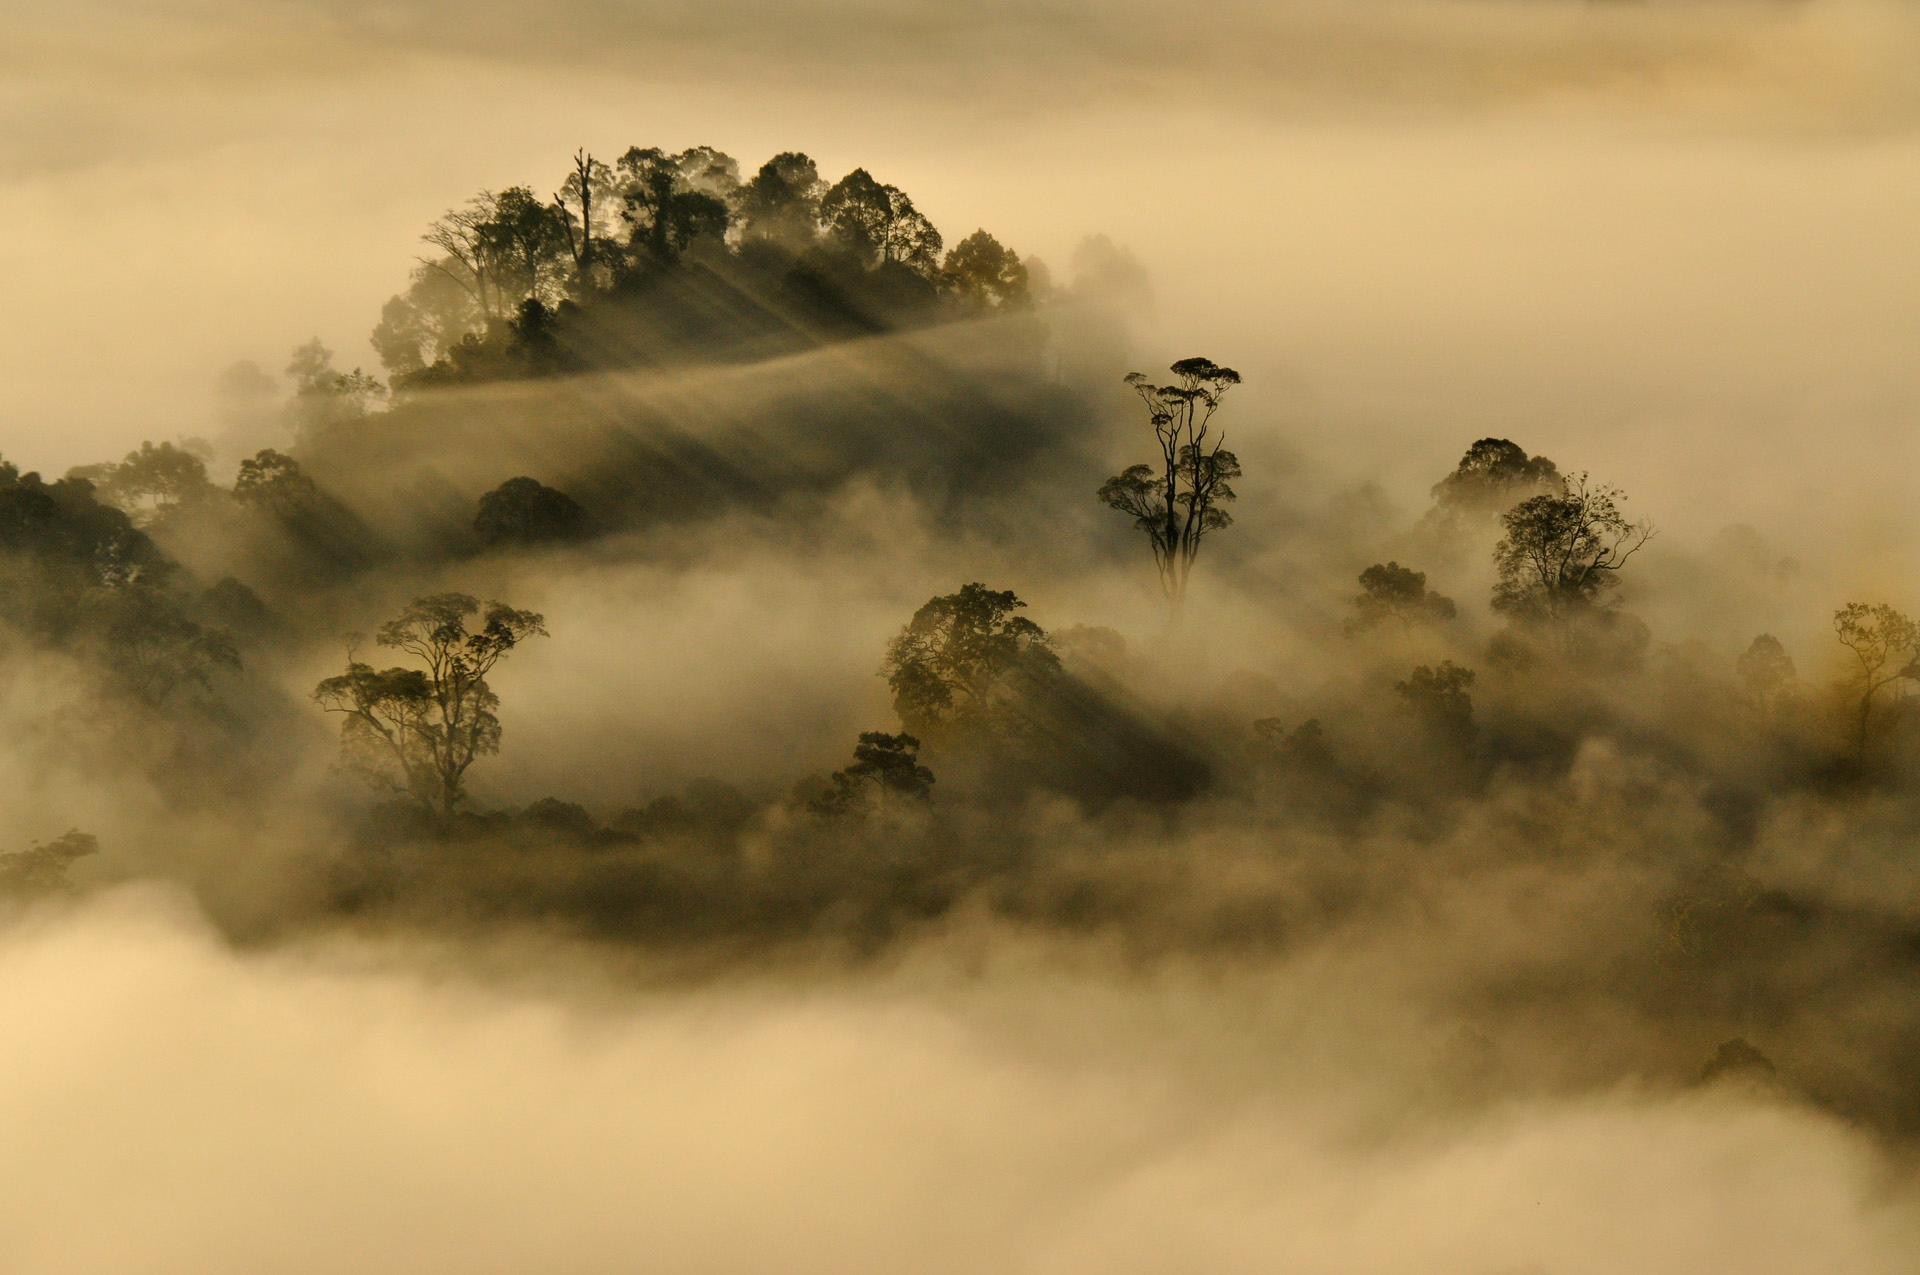 Borneo, Malaysia